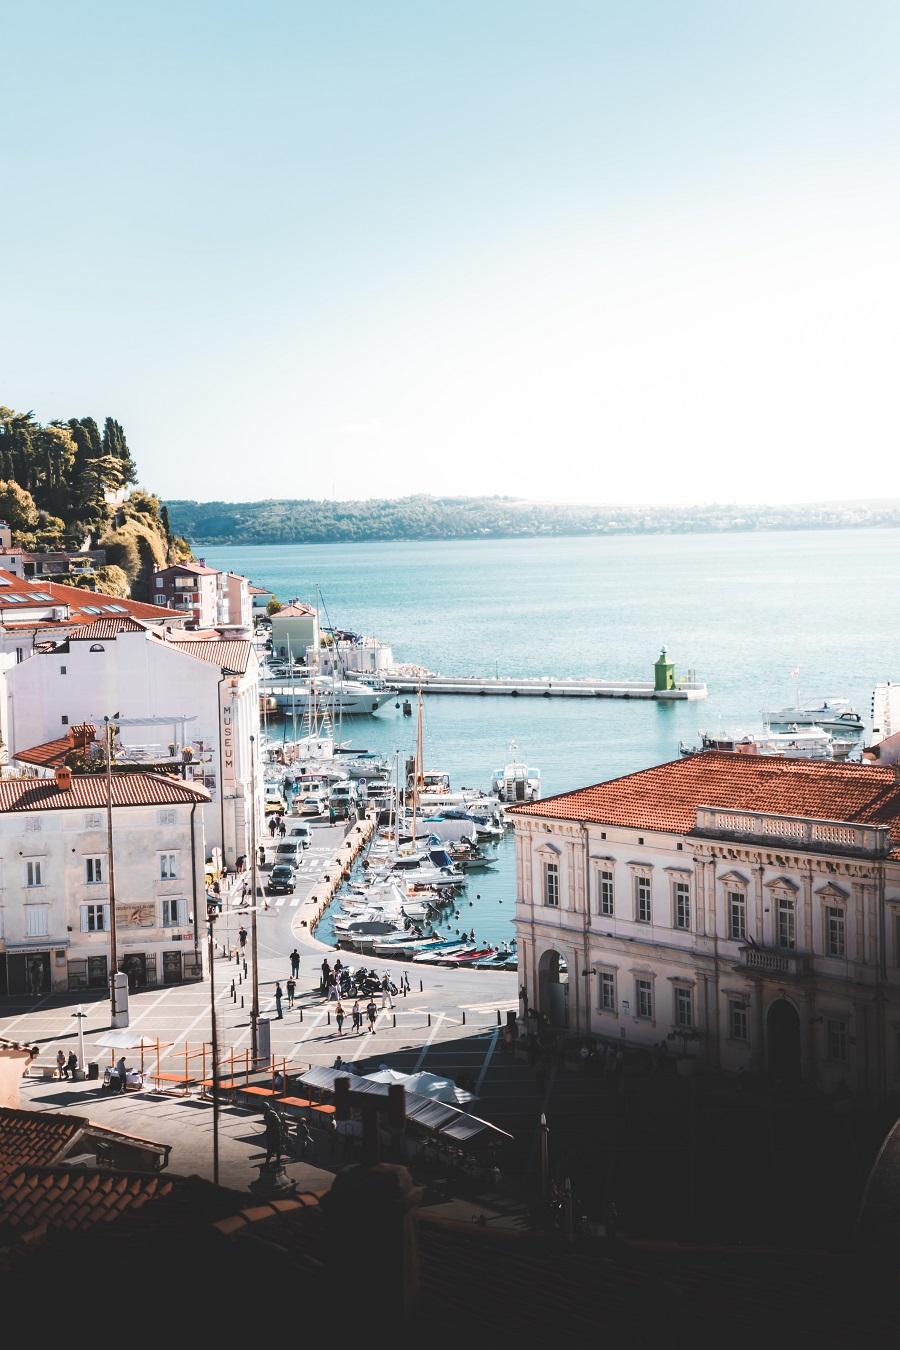 isola di hvar croazia vacanze penisola balcanica